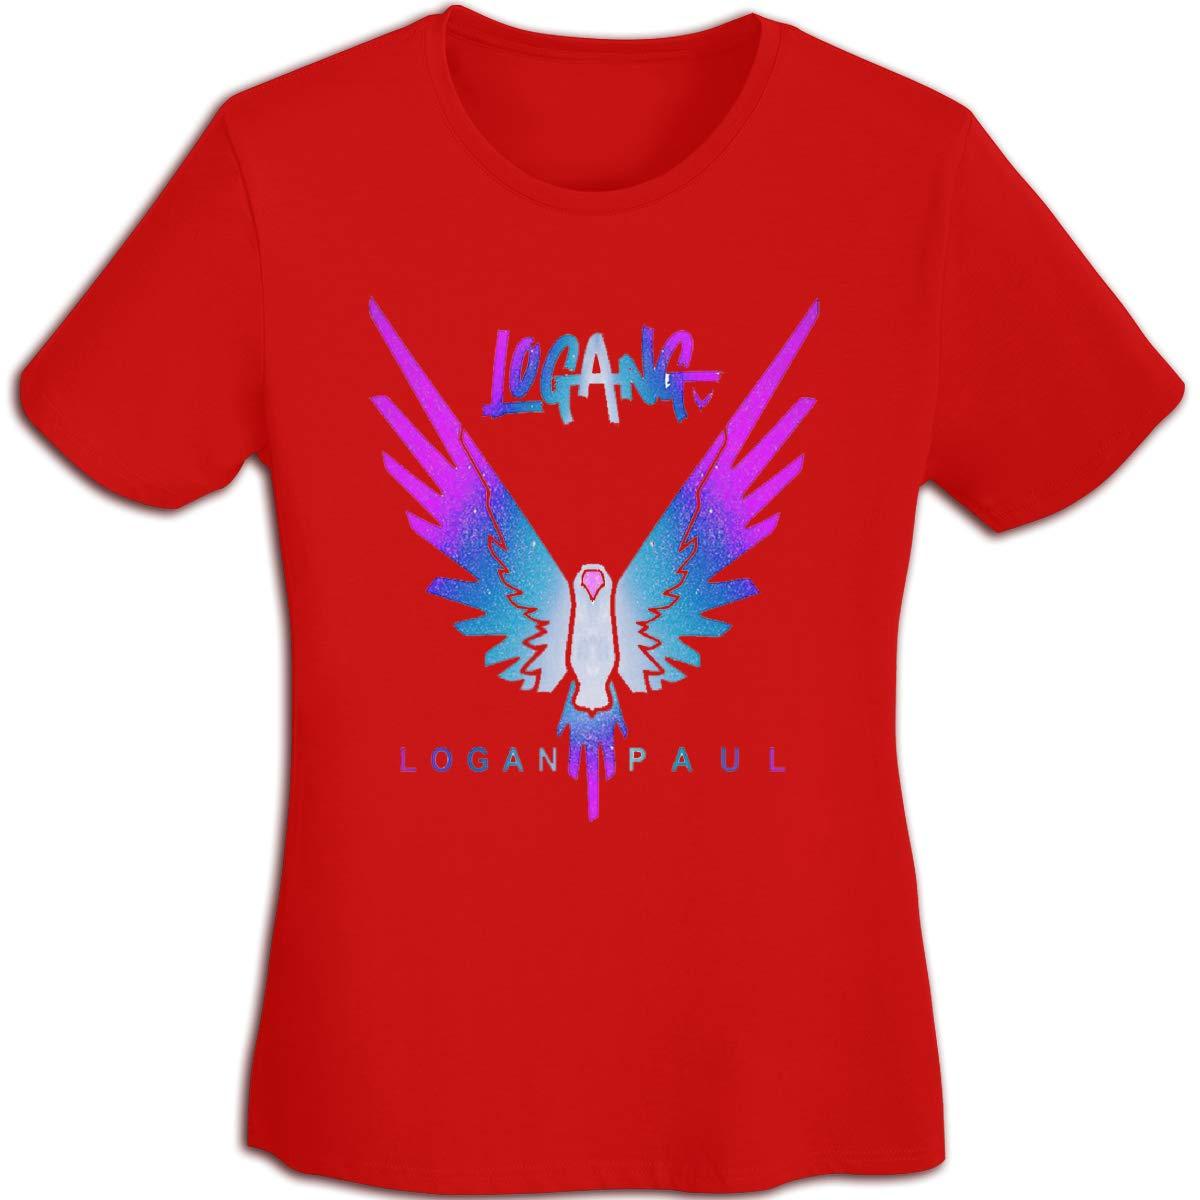 Women's T Shirt Jake Paul Logang Logan Paul Maverick Tee Shirts T-Shirt Short-Sleeve Round Neck Tshirt for Womens Girls Red XL by BKashy